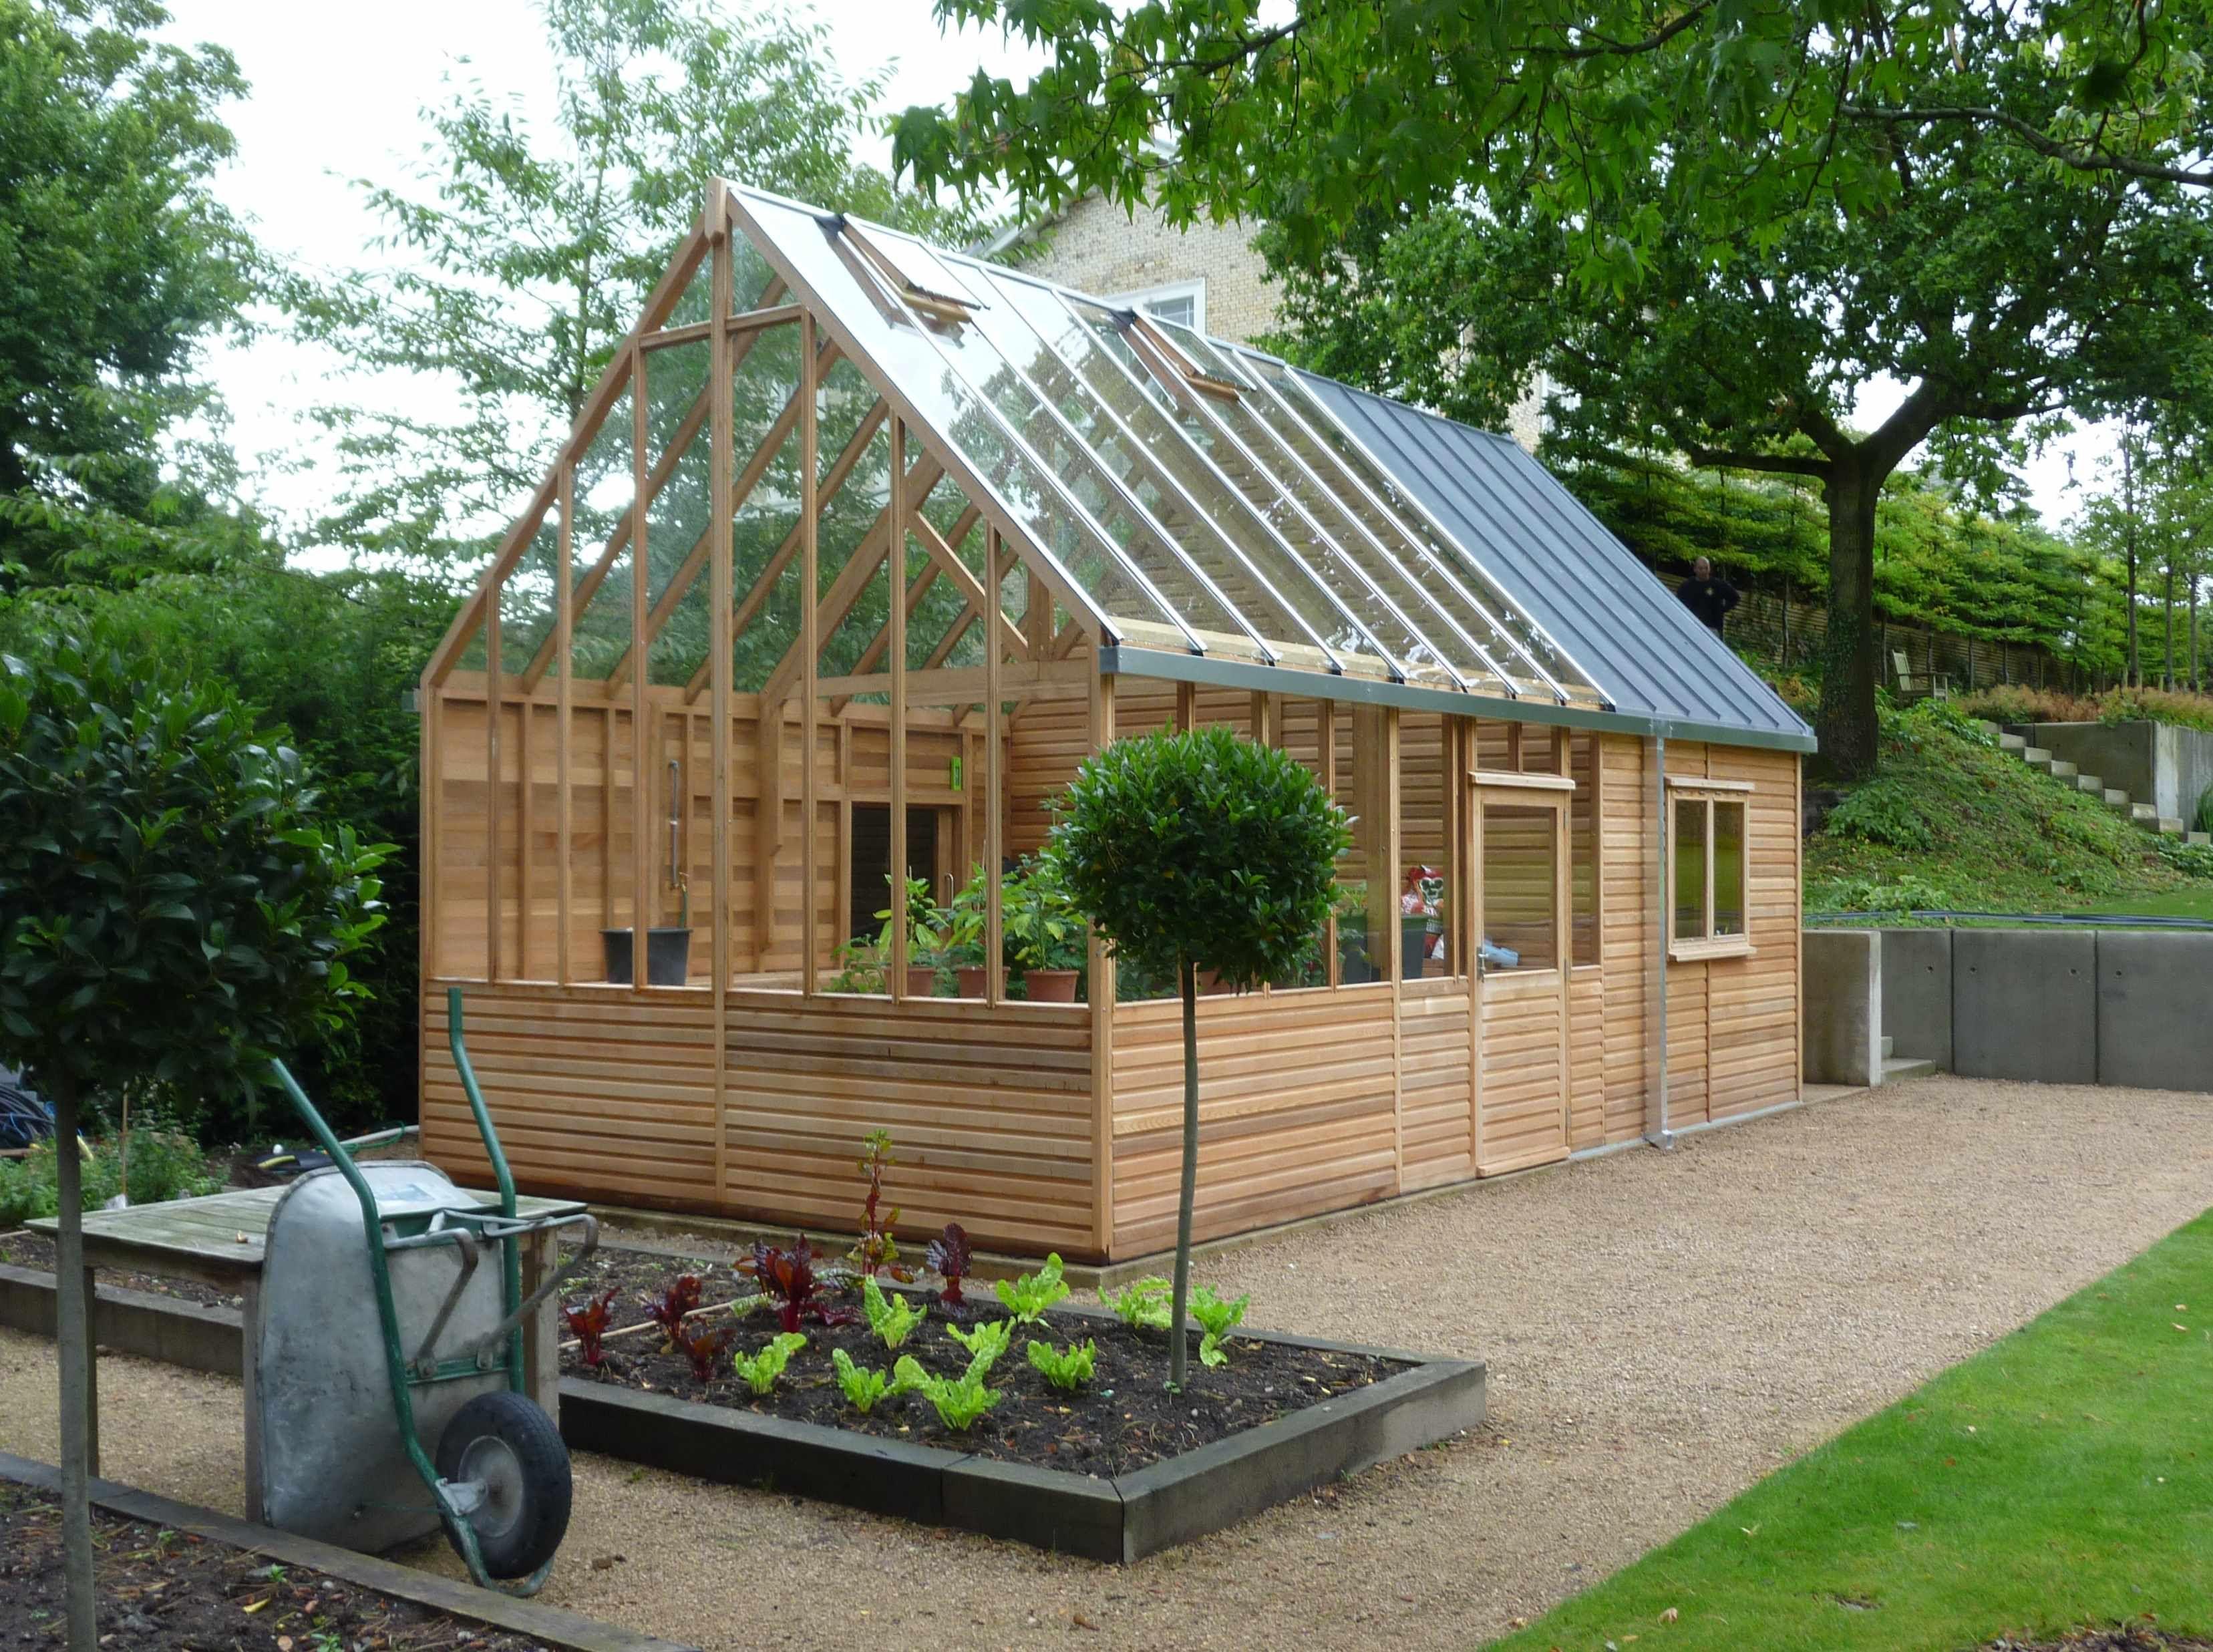 Kings Bromley Backyard Greenhouse Build A Greenhouse